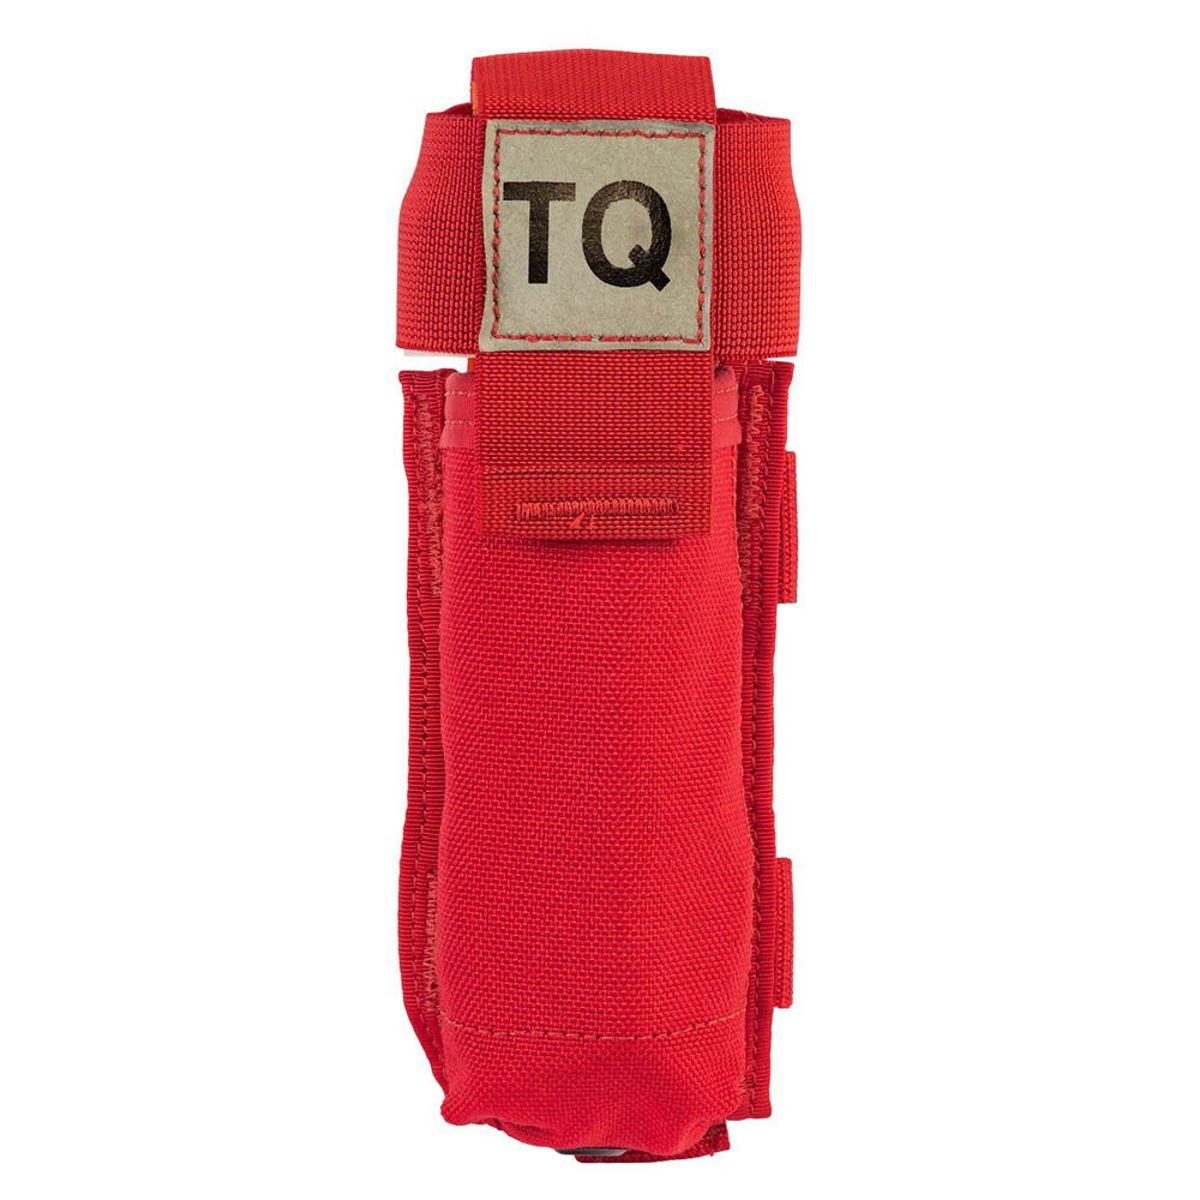 C-a-t tourniquet houder aan riem rood